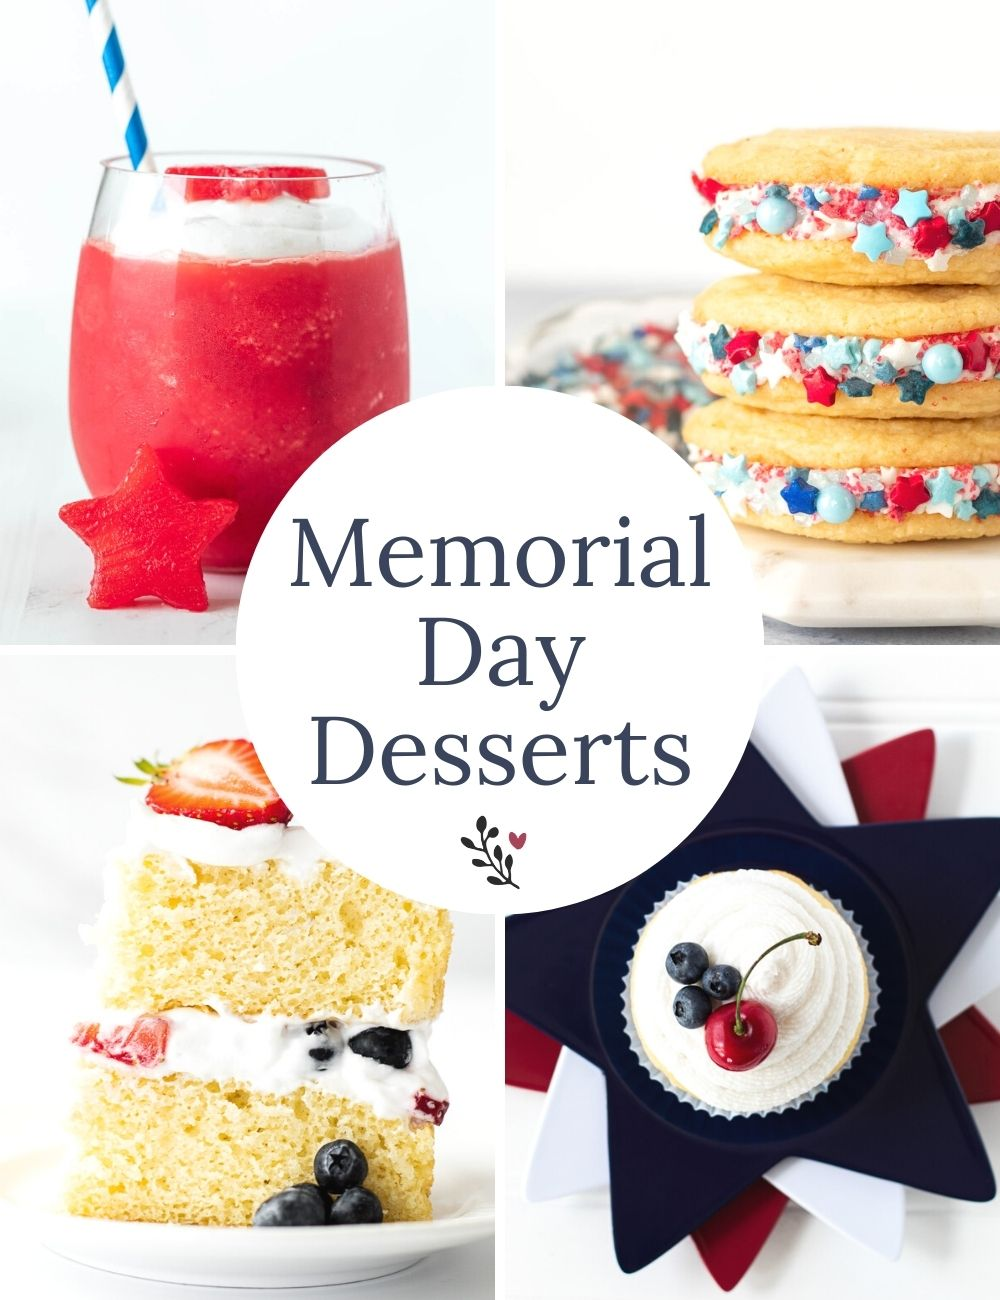 Memorial day desserts recipe round up